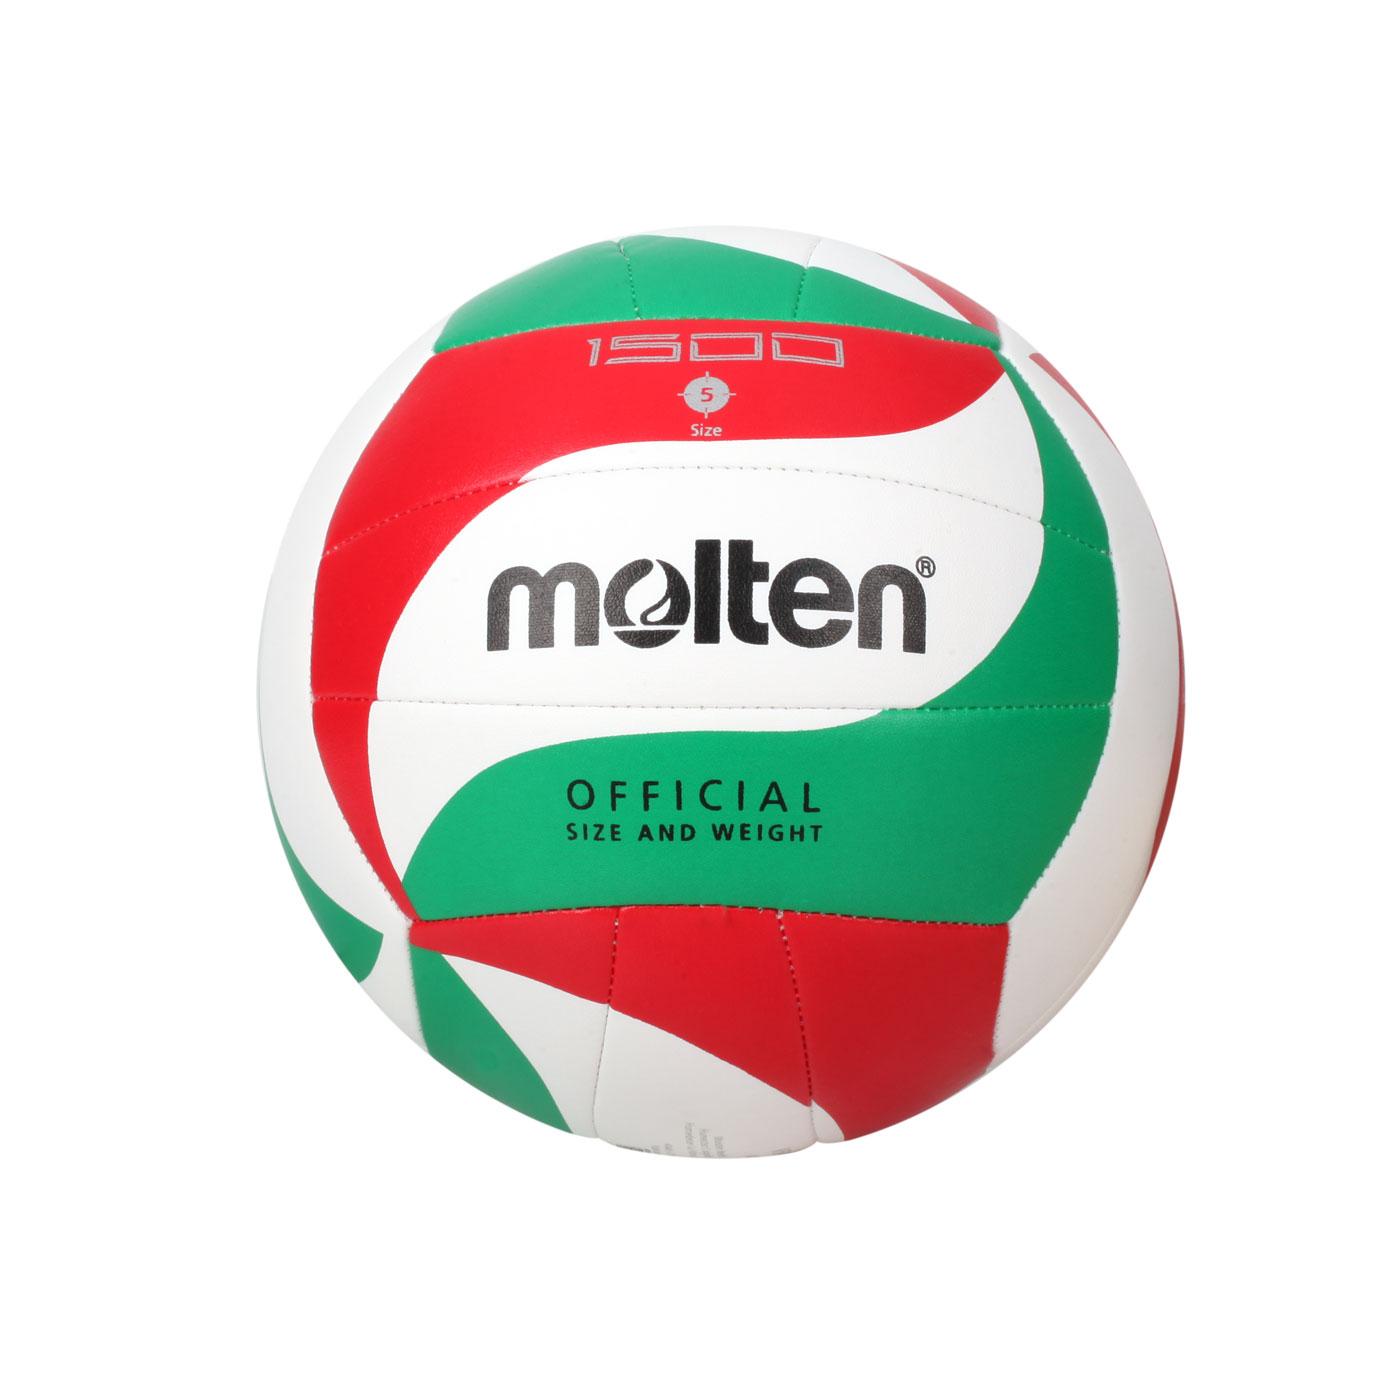 Molten #5合成皮排球 V5M1500 - 白紅綠